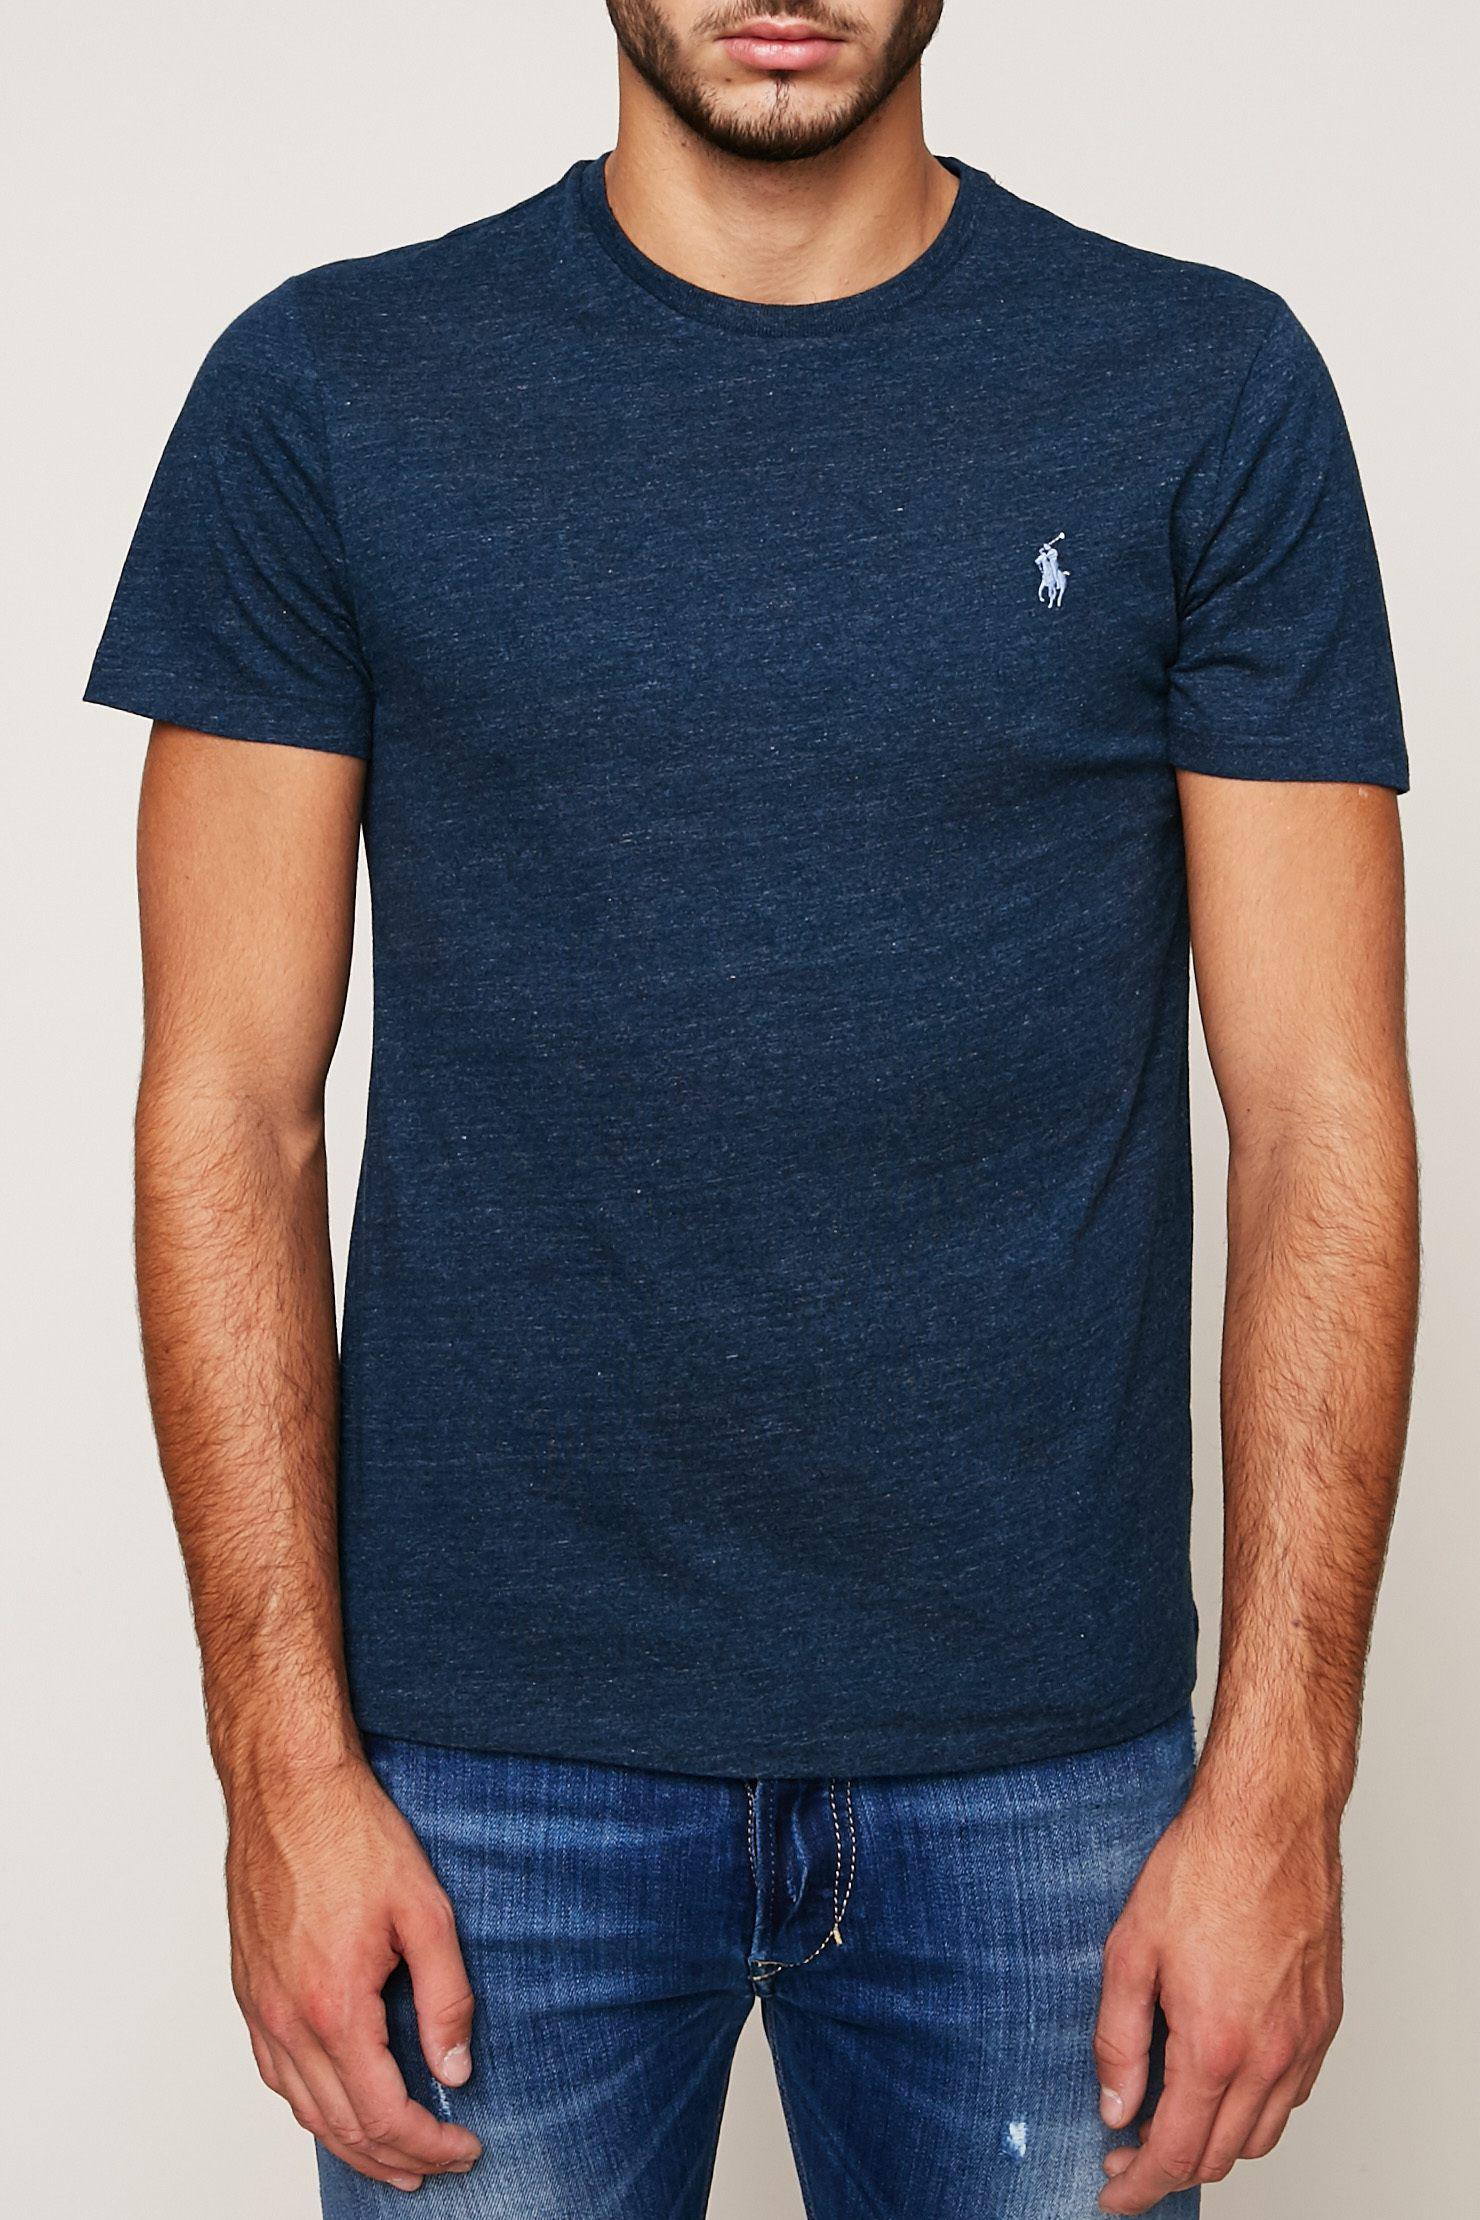 polo ralph lauren t shirt in blue for men lyst. Black Bedroom Furniture Sets. Home Design Ideas